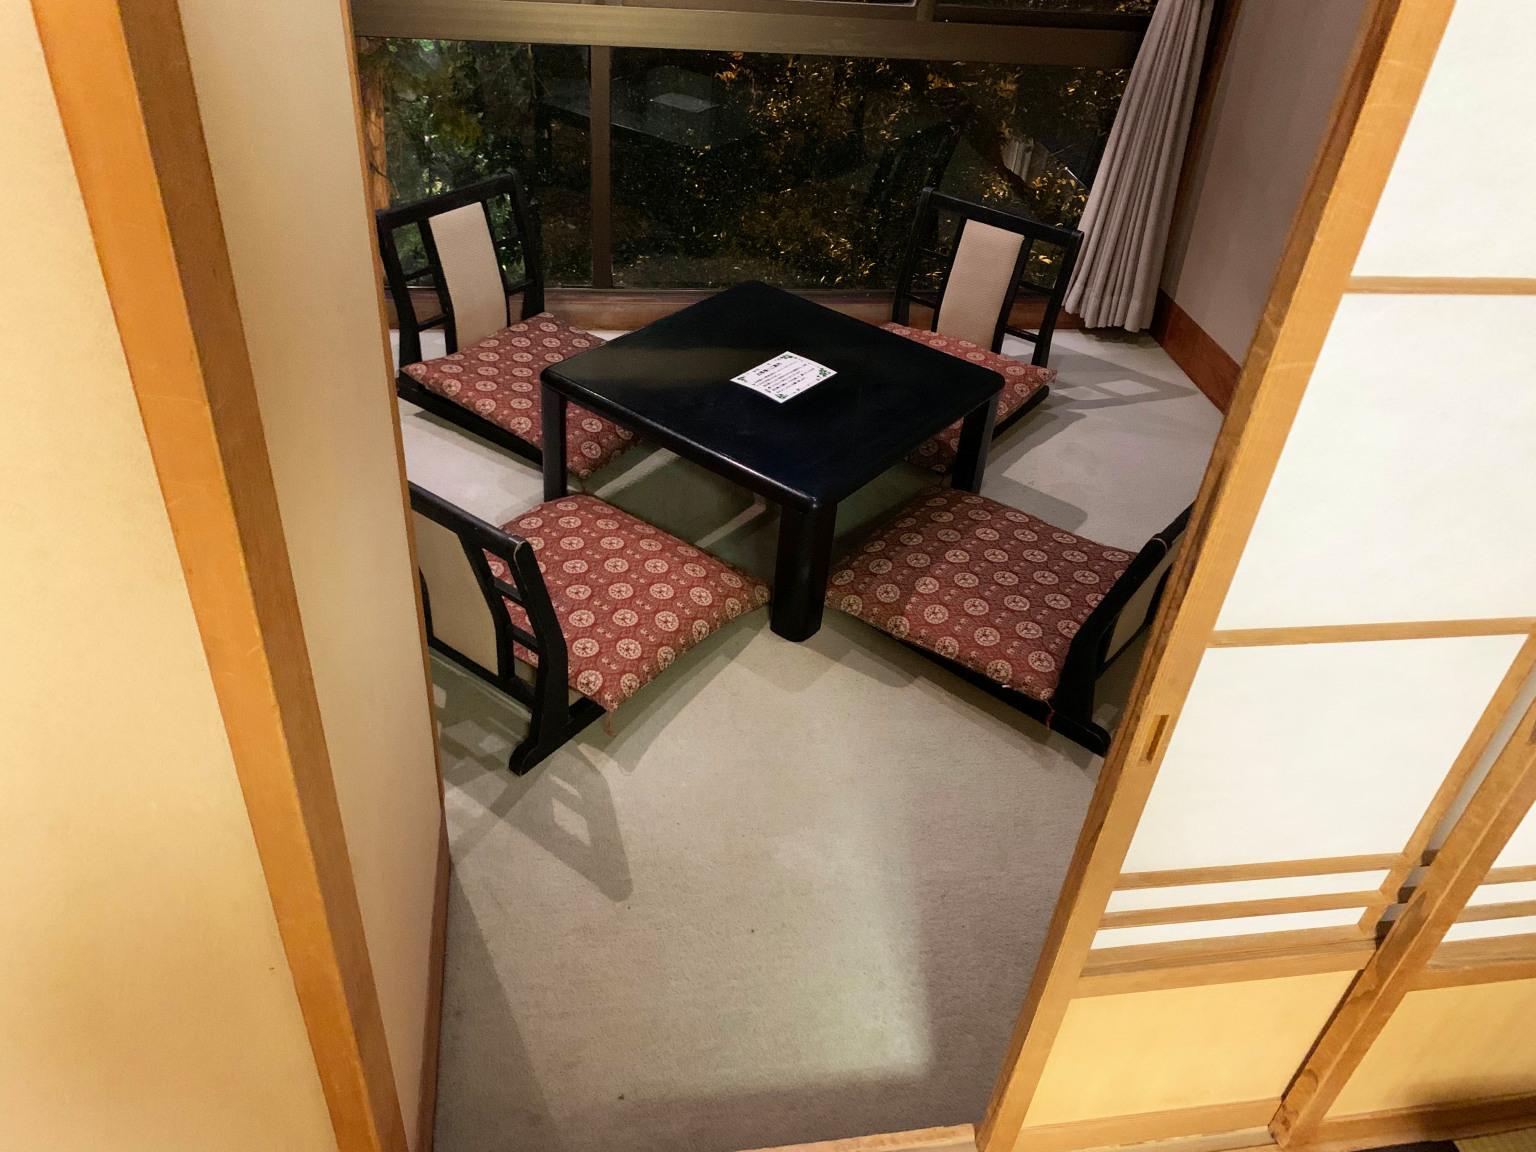 Houshi-Ryokan-onsen-hotel-oldest-in-world-Japan-business-travel-Hoshi-accommodation-stay-photos-reviews-Ishikawa-7.jpg